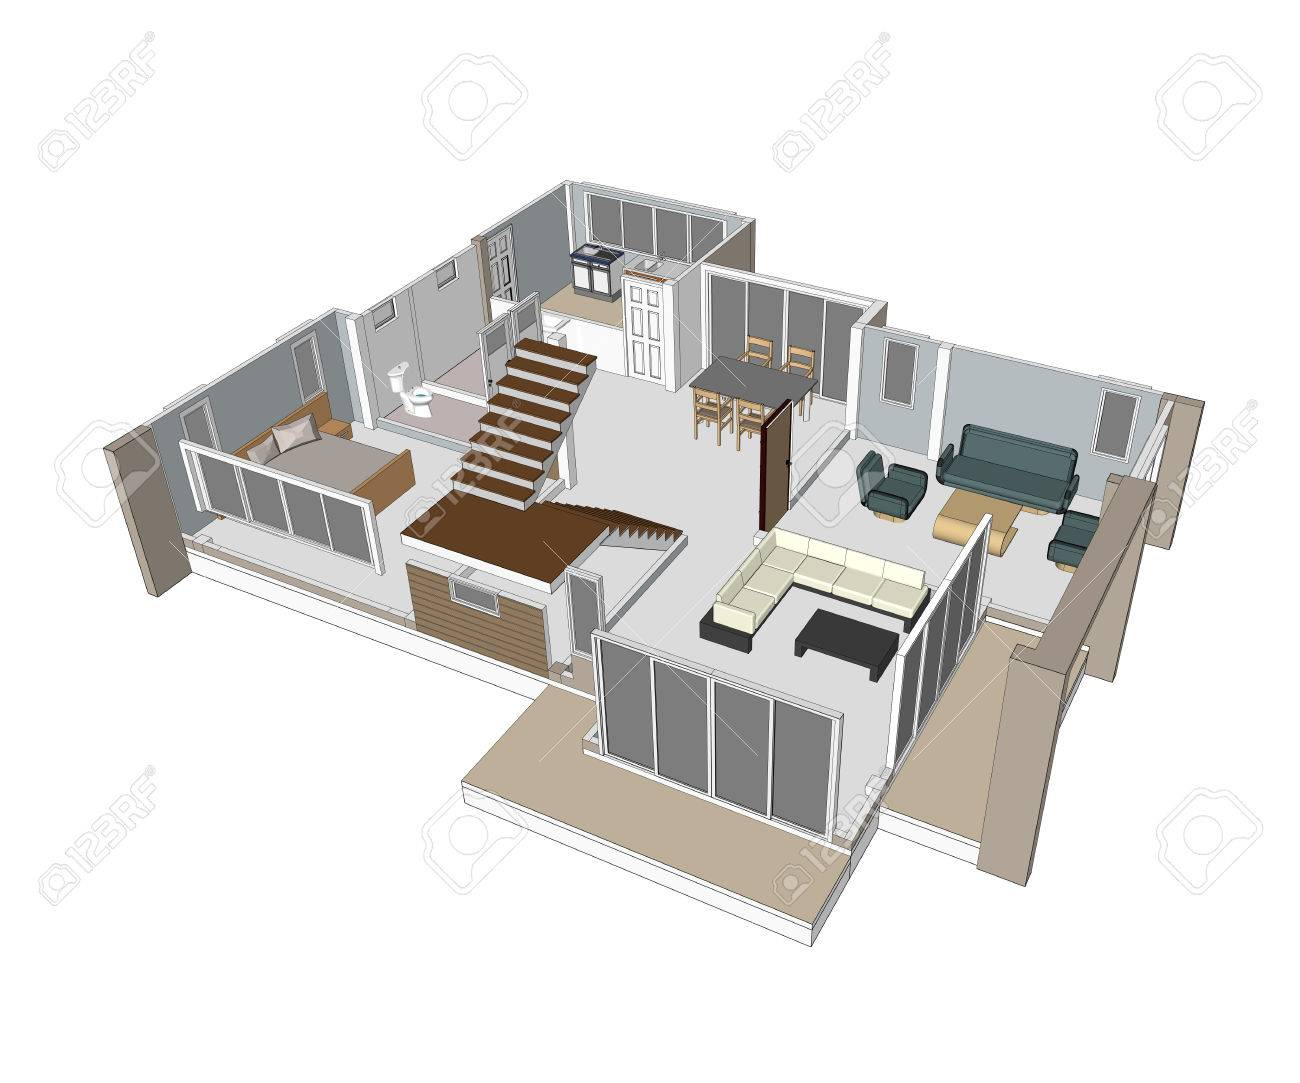 Drawings design houses - 41145169